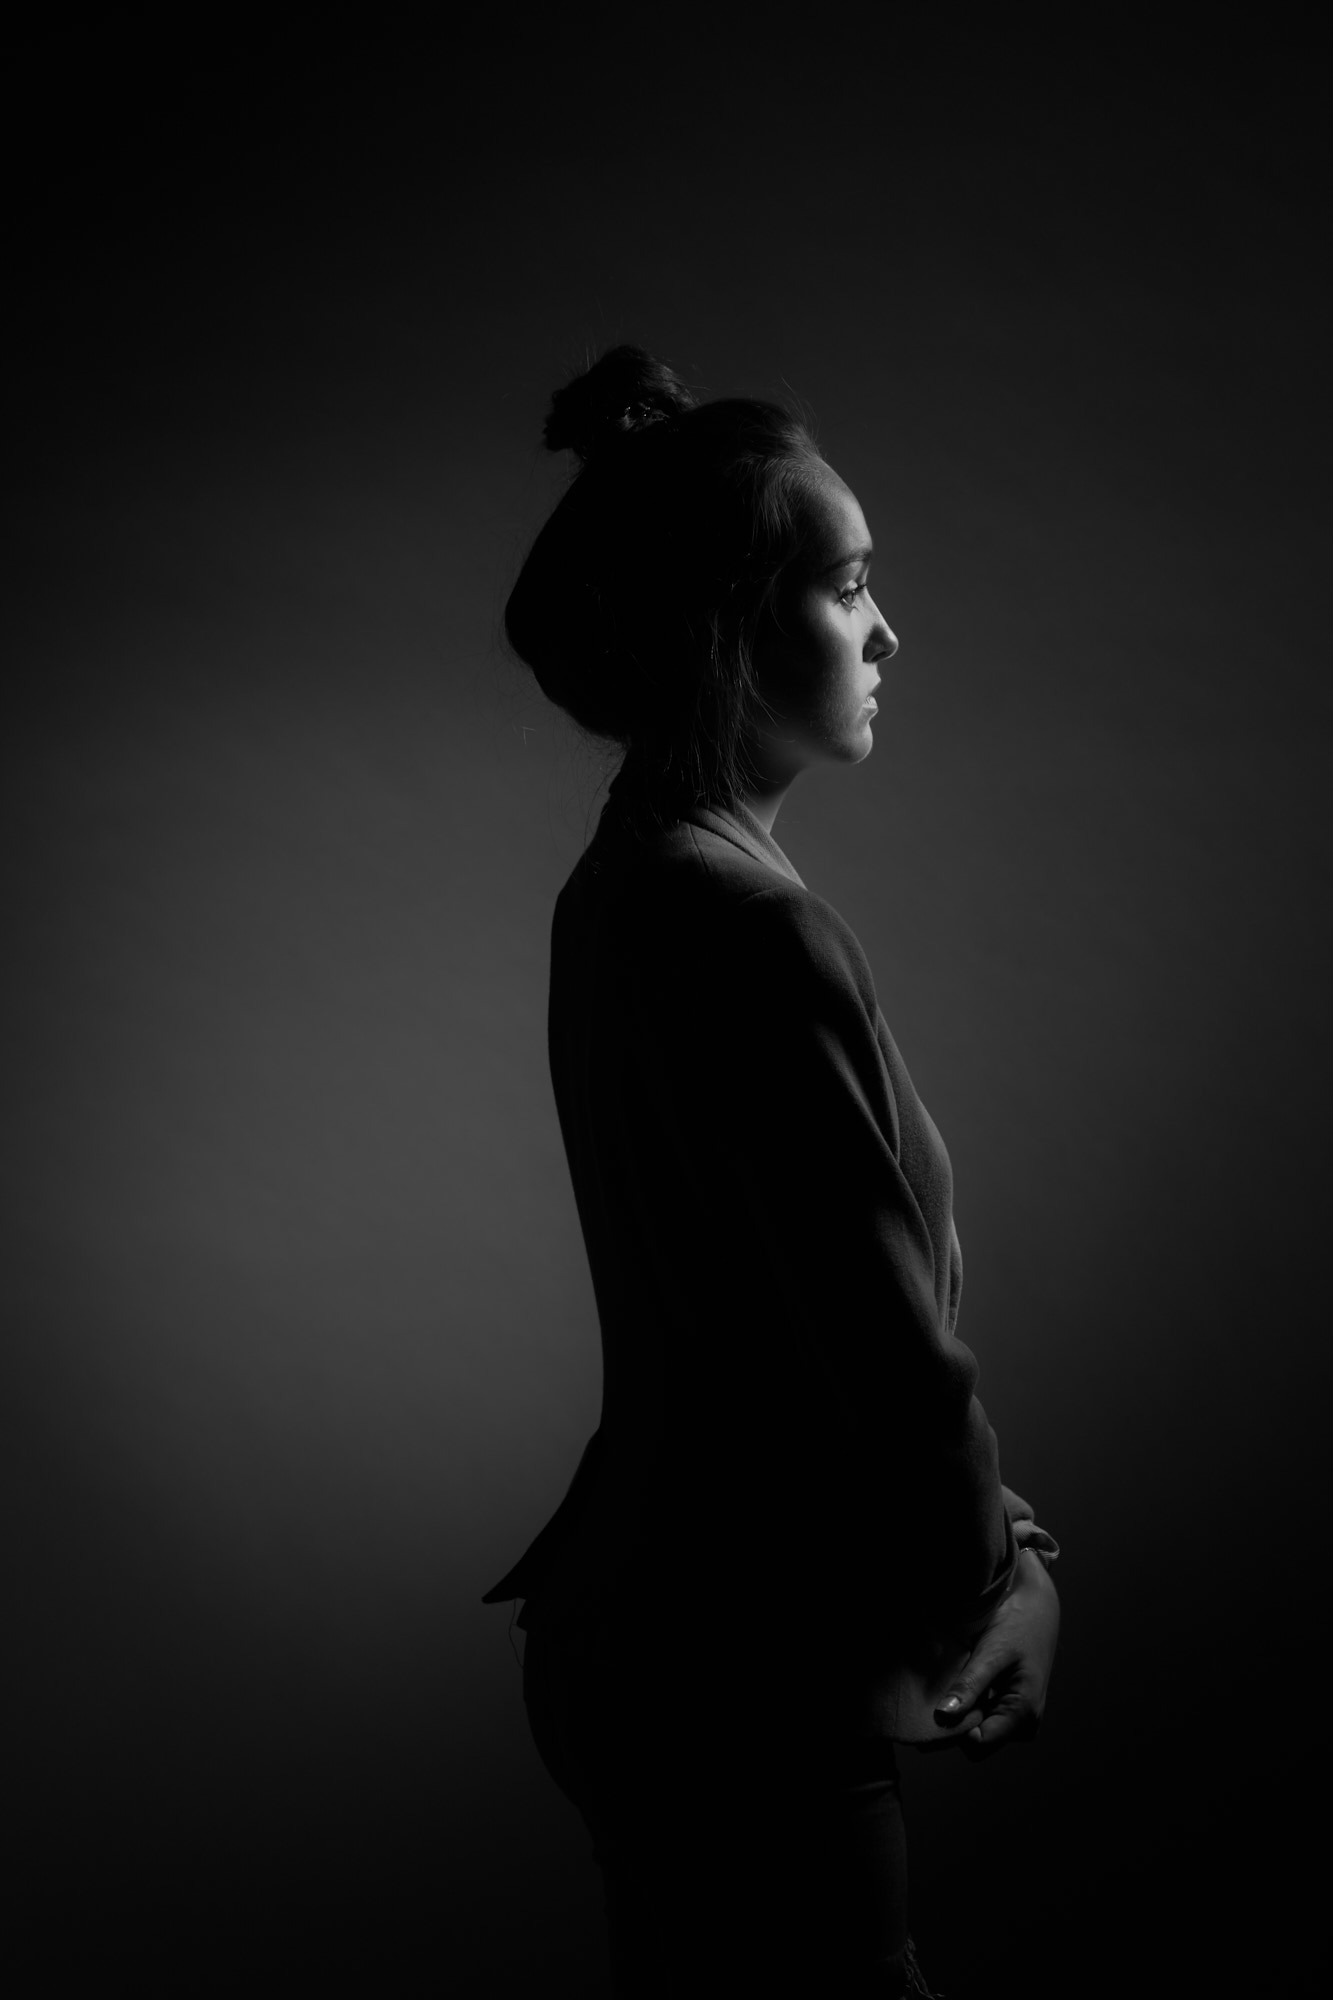 Profil Pose Studio